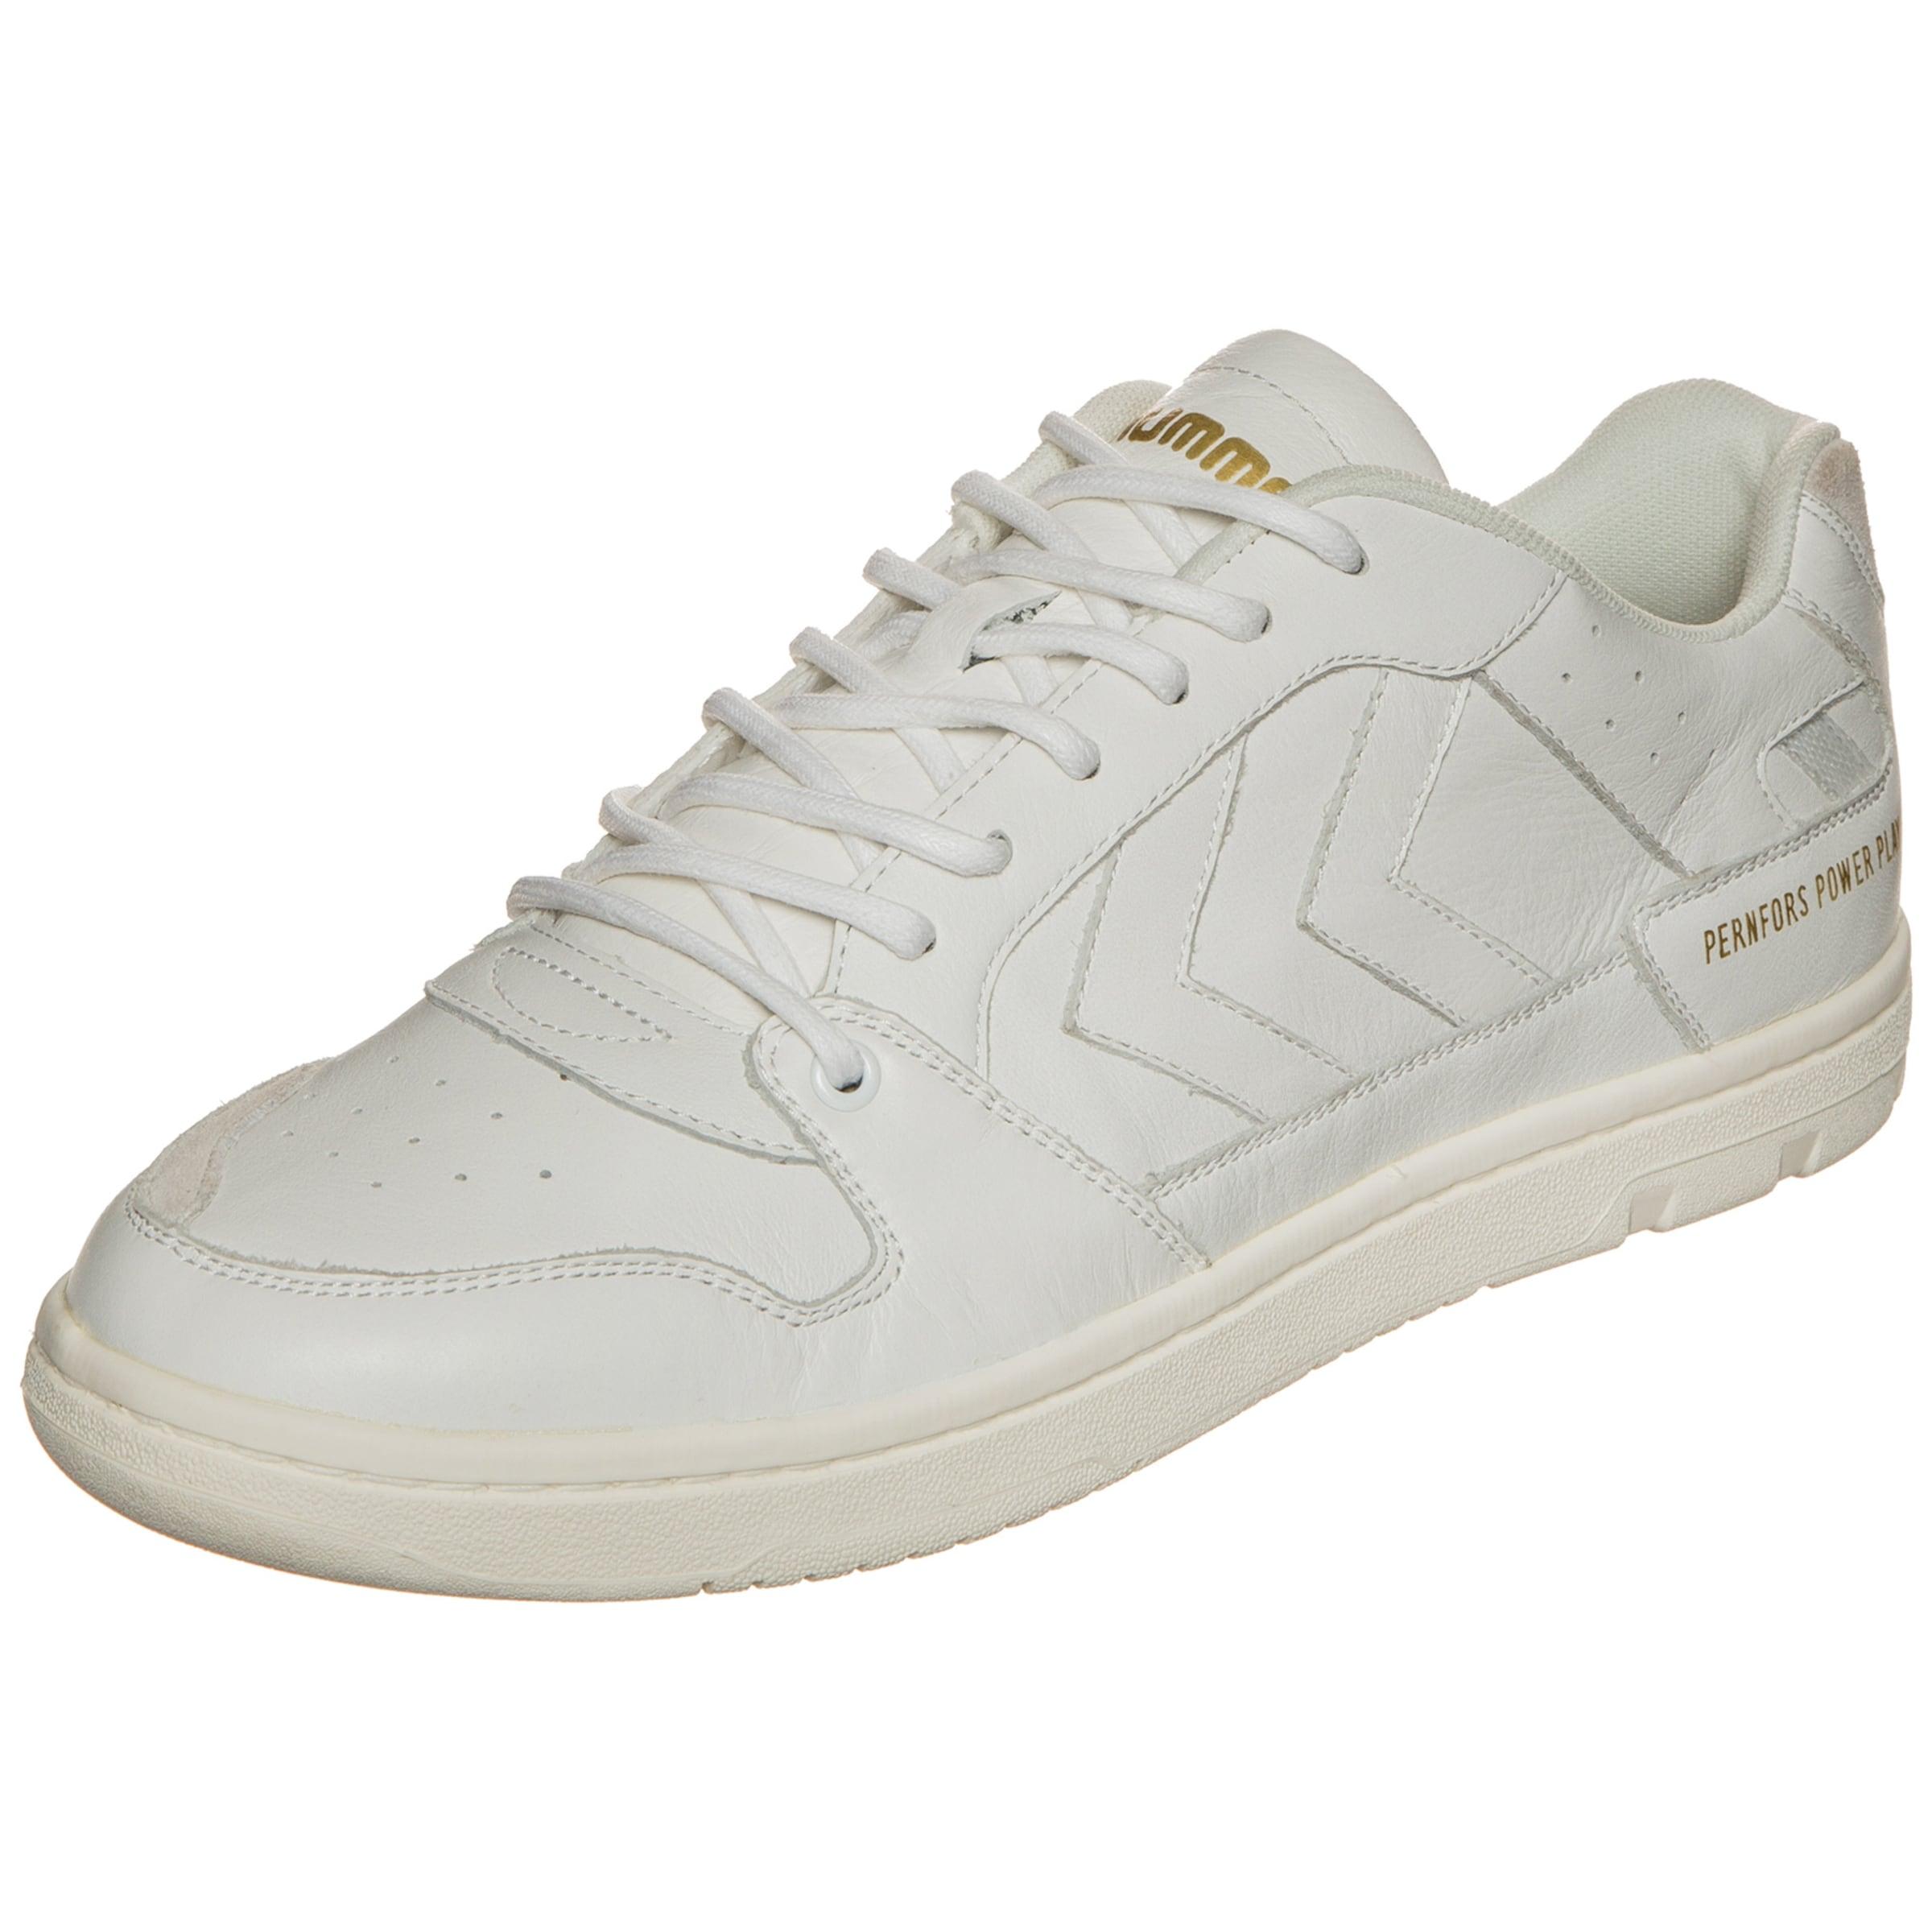 Hummel Sneaker Pernfors Power Play Hohe Qualität